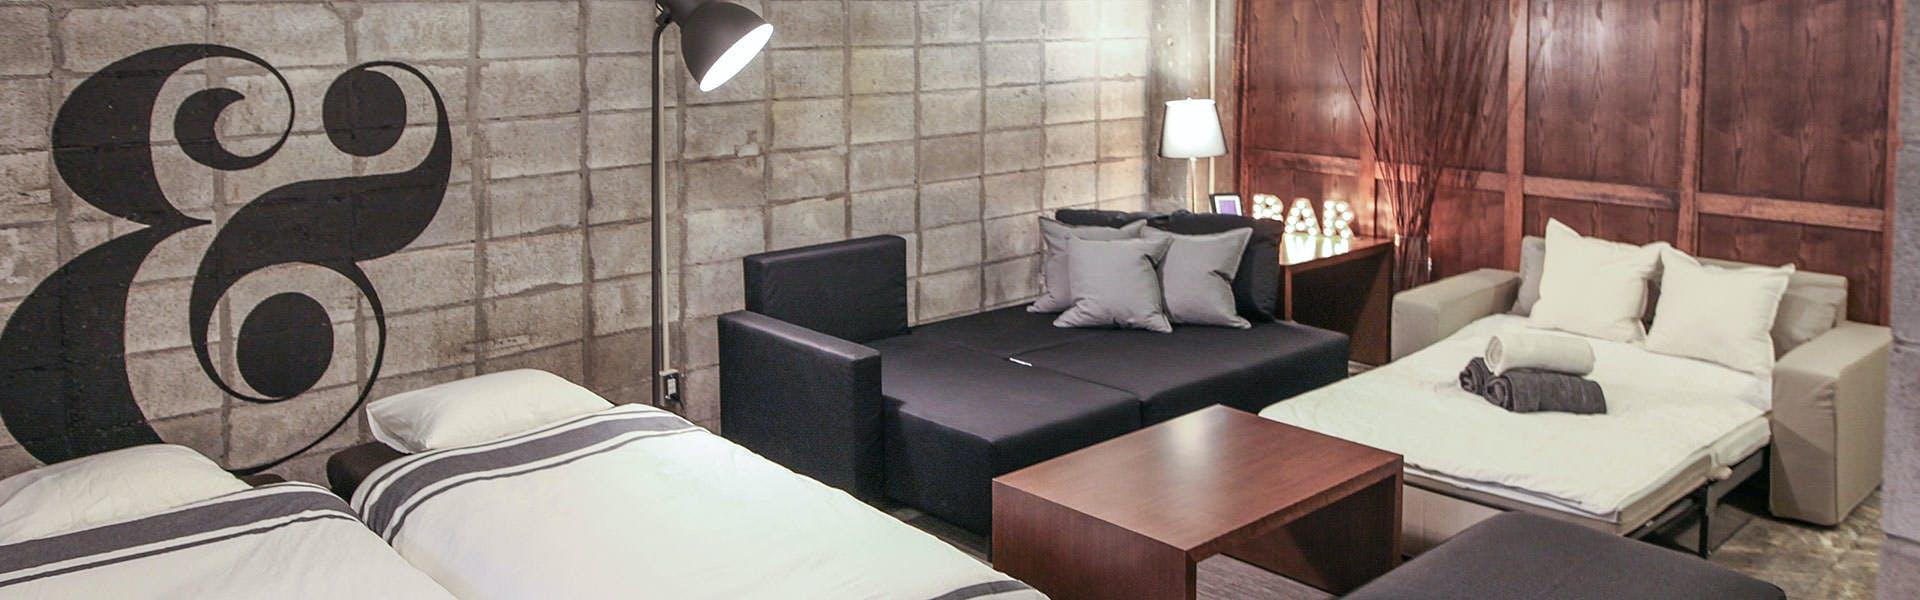 Room-001 ベッドルーム